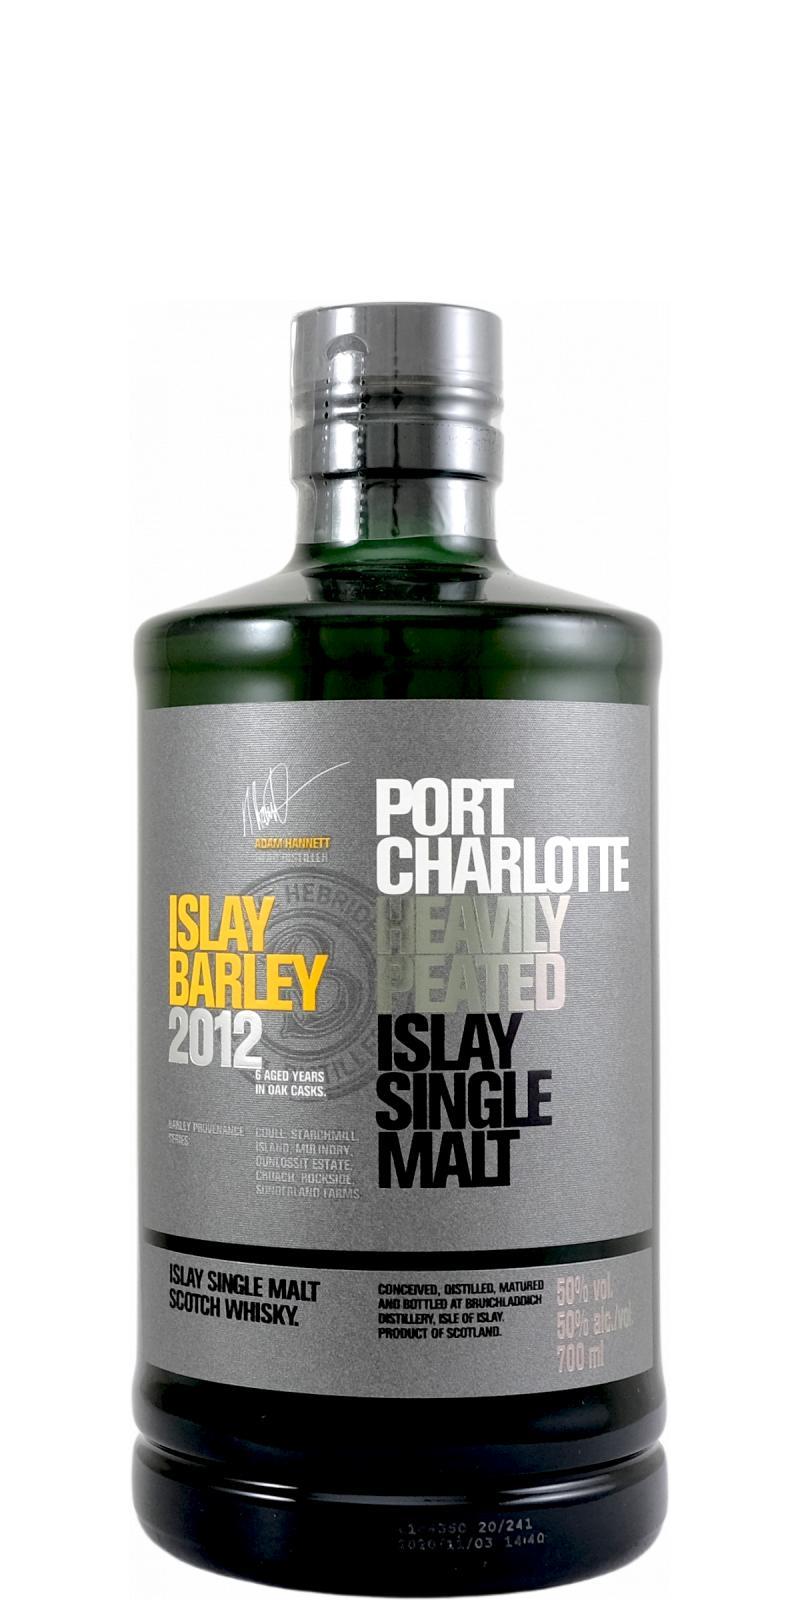 Port Charlotte 2012